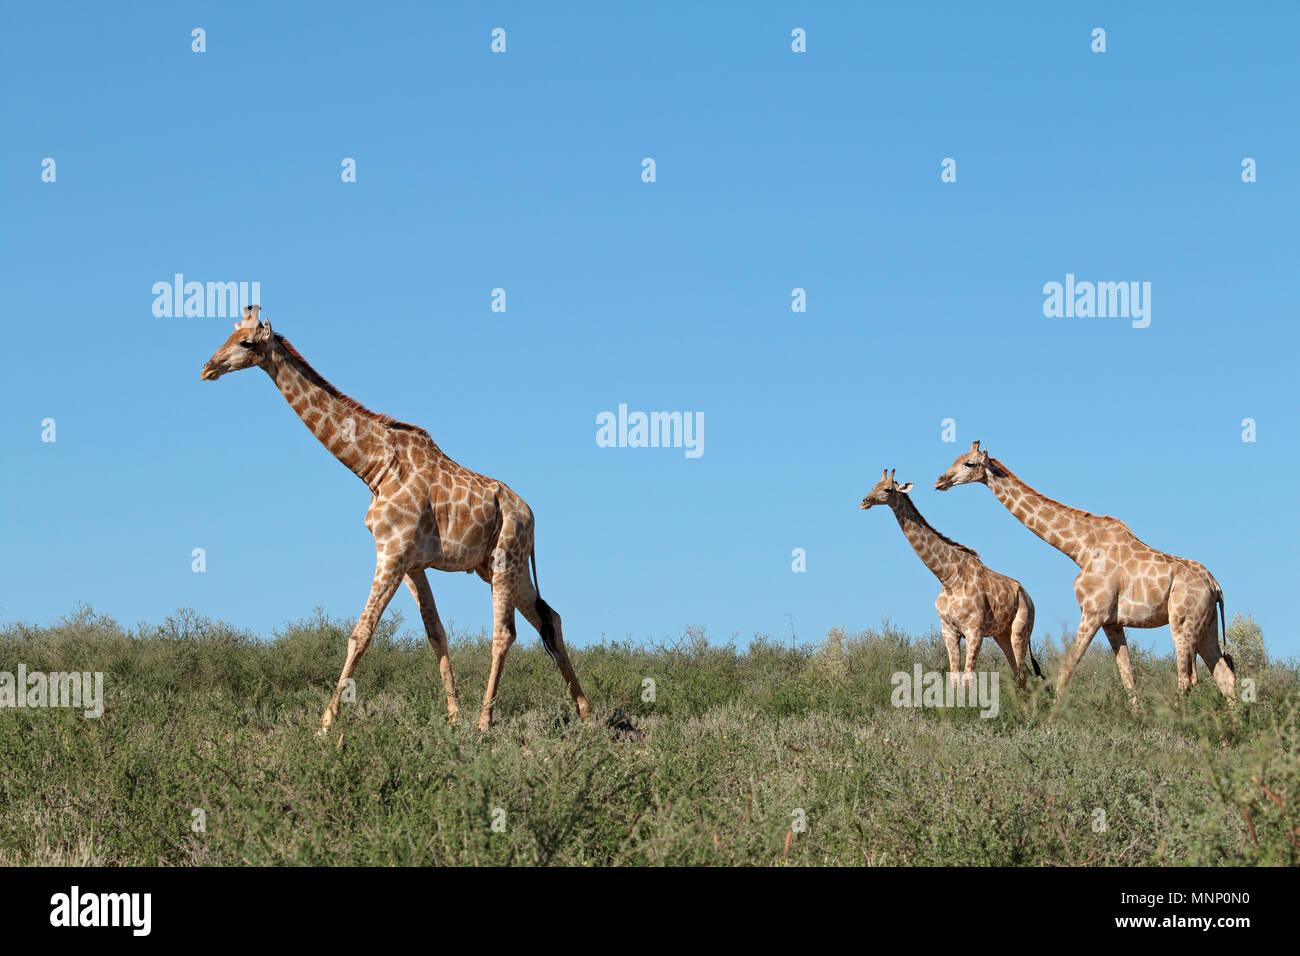 Giraffes (Giraffa camelopardalis) against a blue sky, Kalahari desert, South Africa Stock Photo